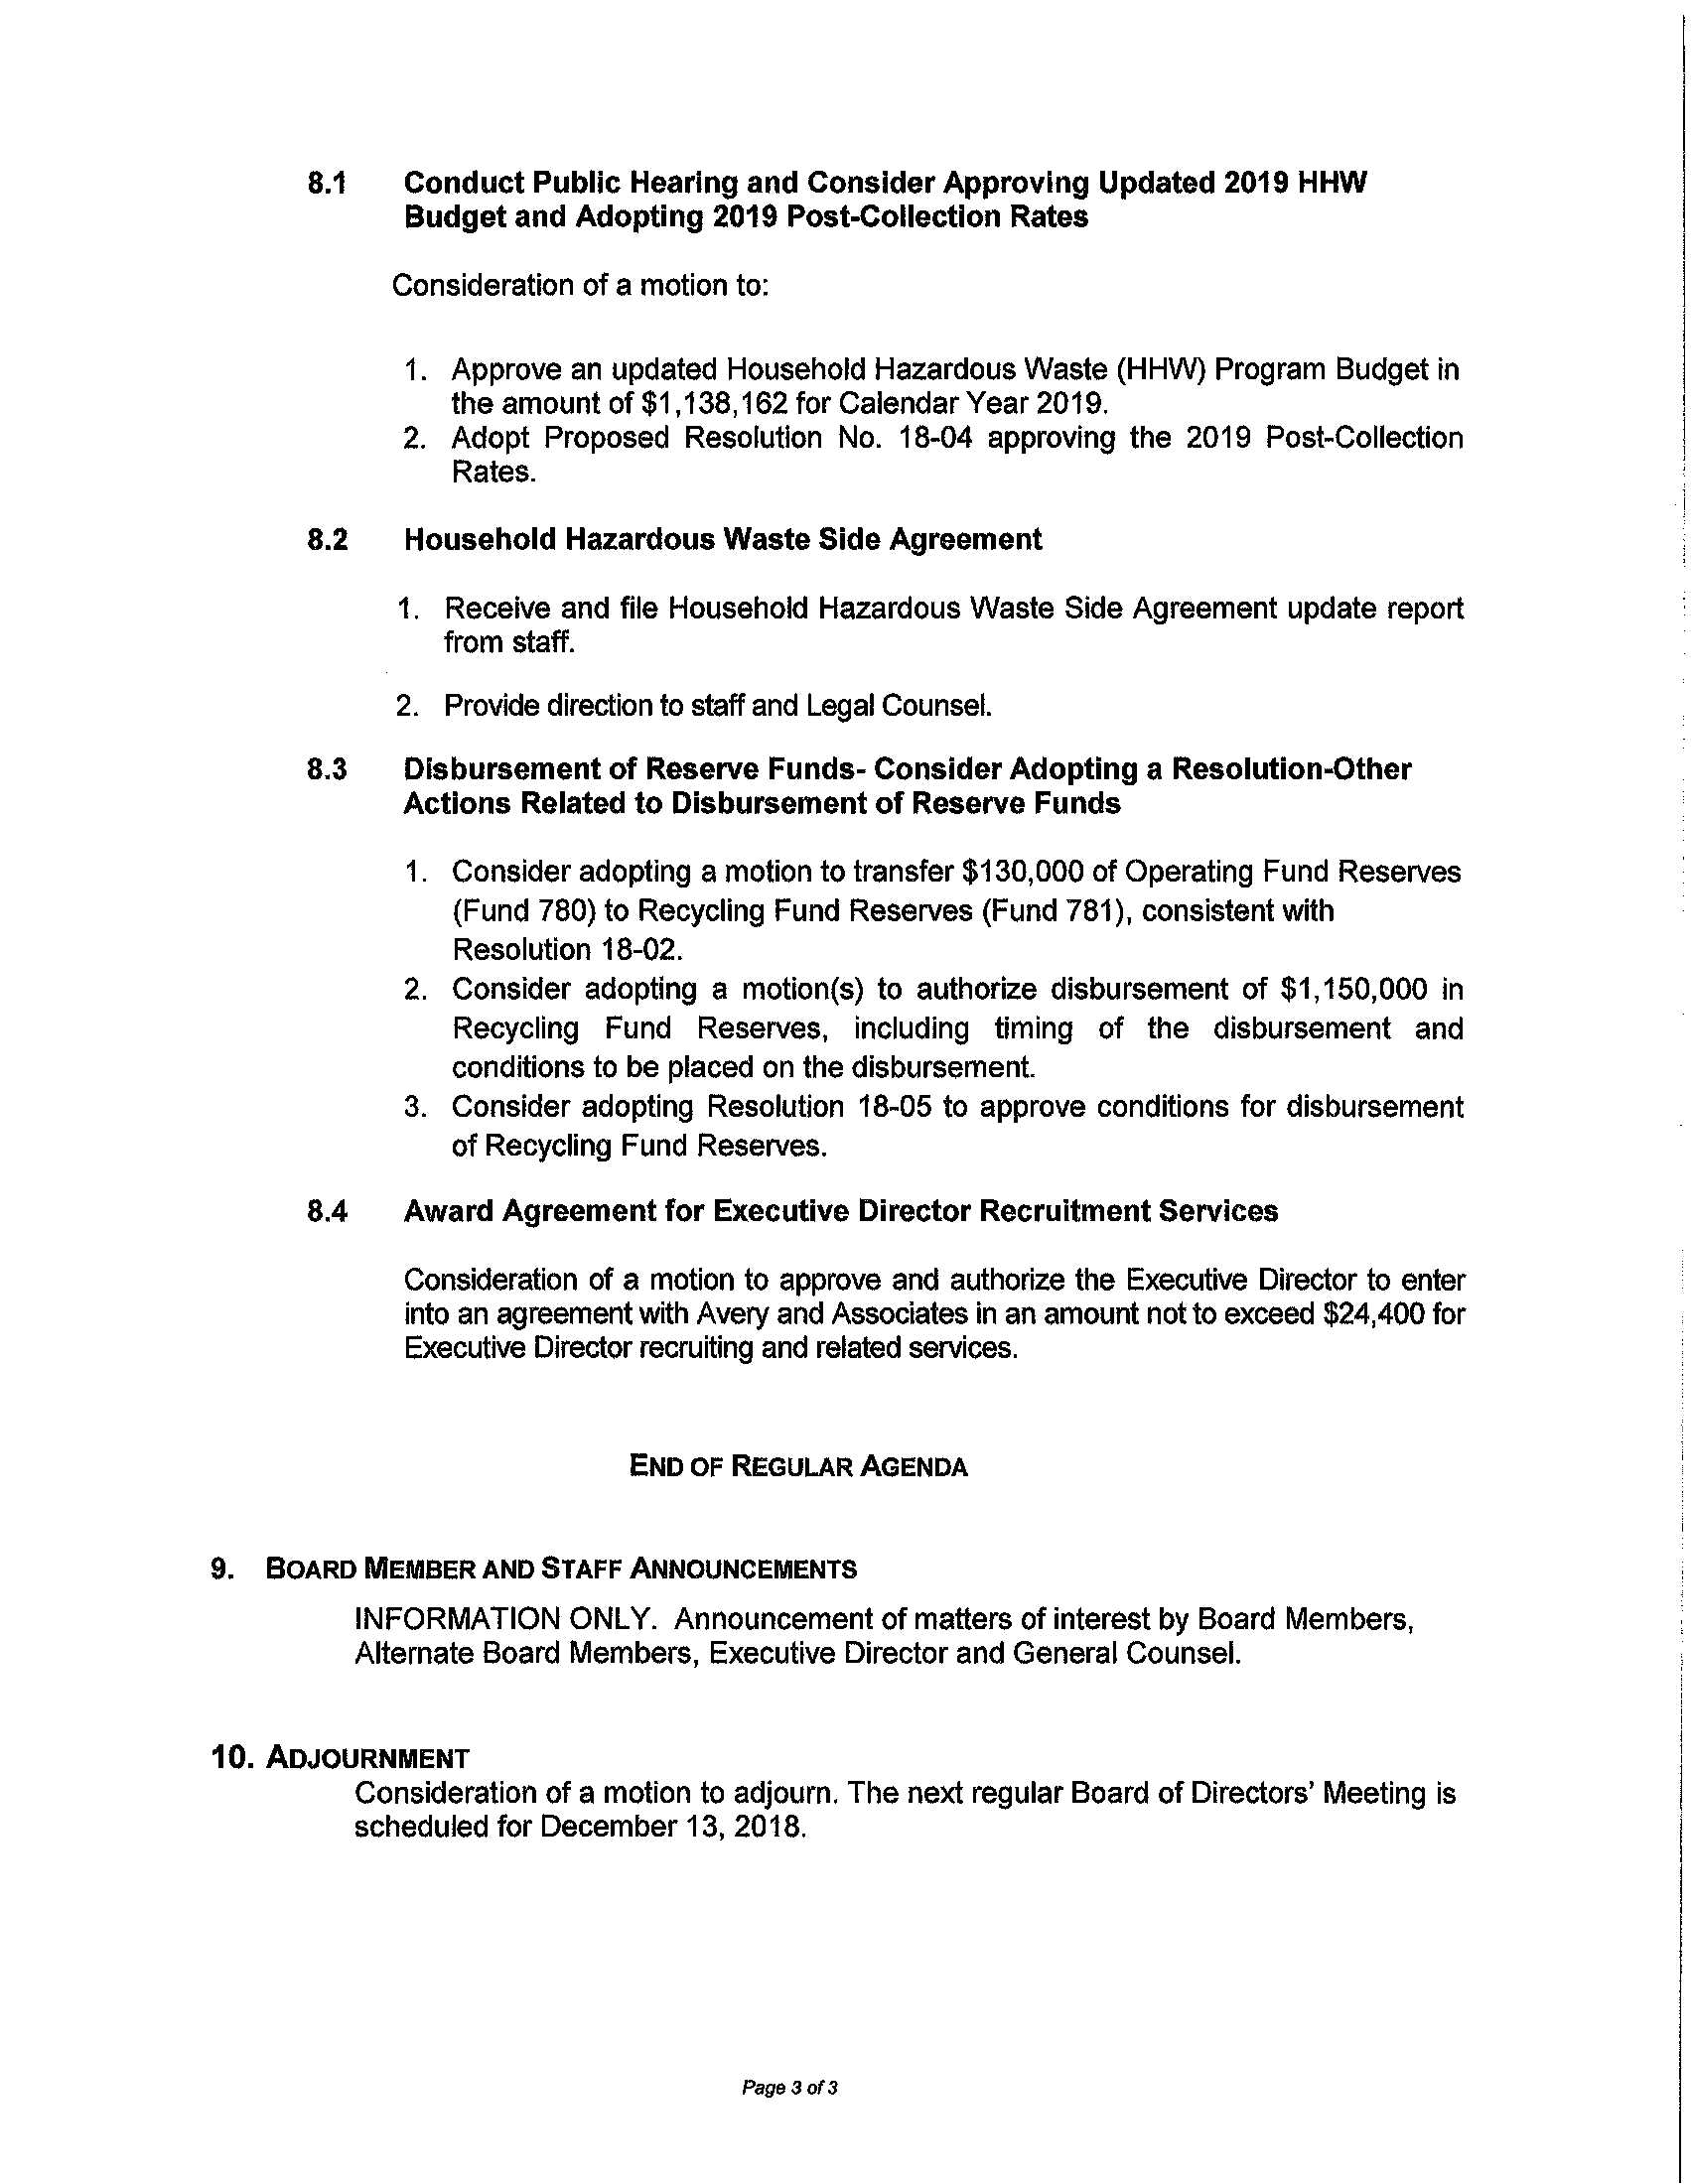 ESMAC Agenda 11.14.2018 (46 Pages)_34.jpg